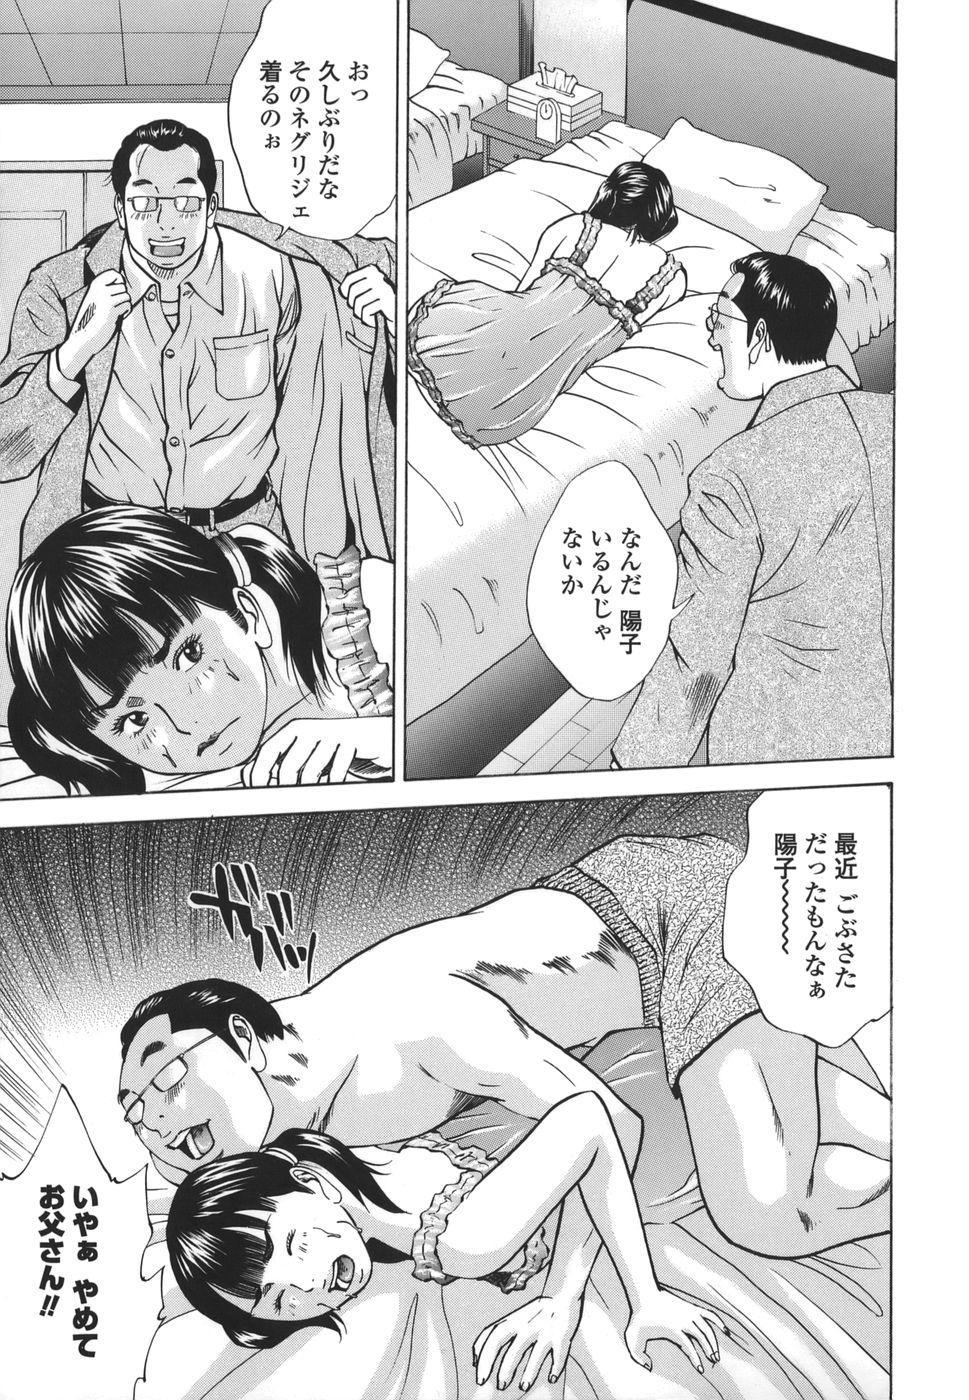 Kinshin Goukan - Near Relation Rapes 134